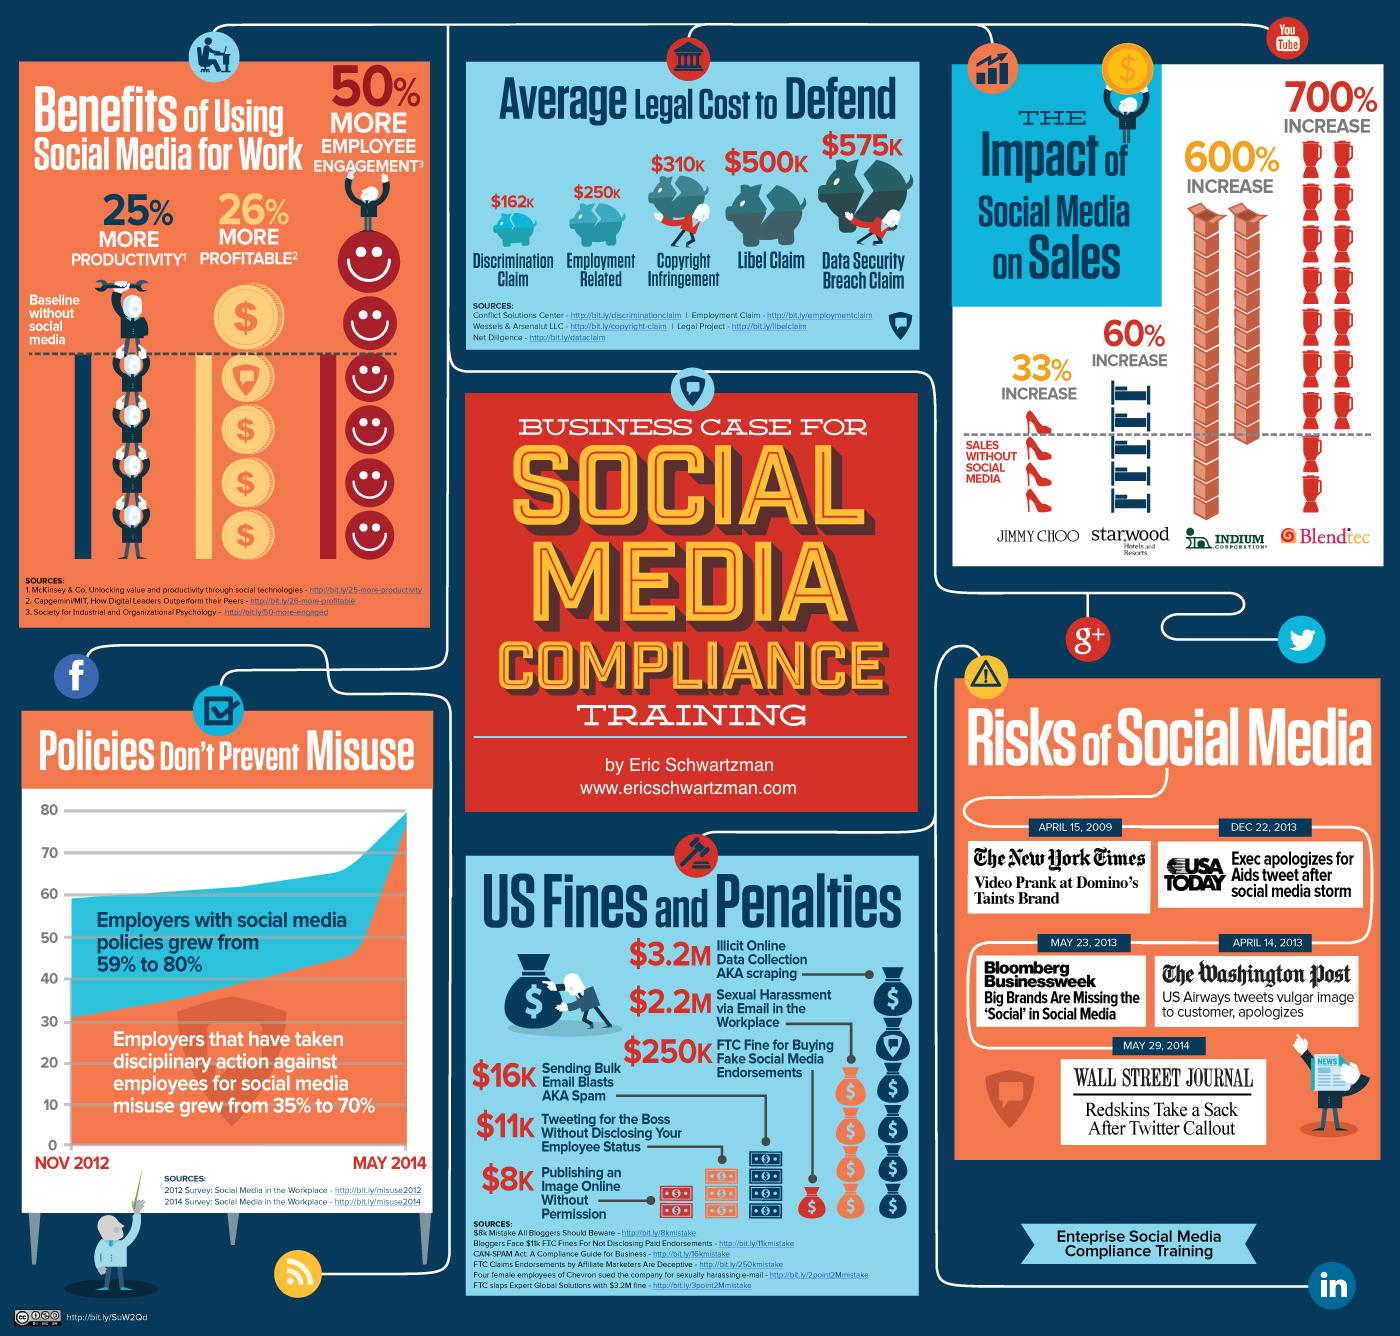 Benefits-Infographic-Watermarked